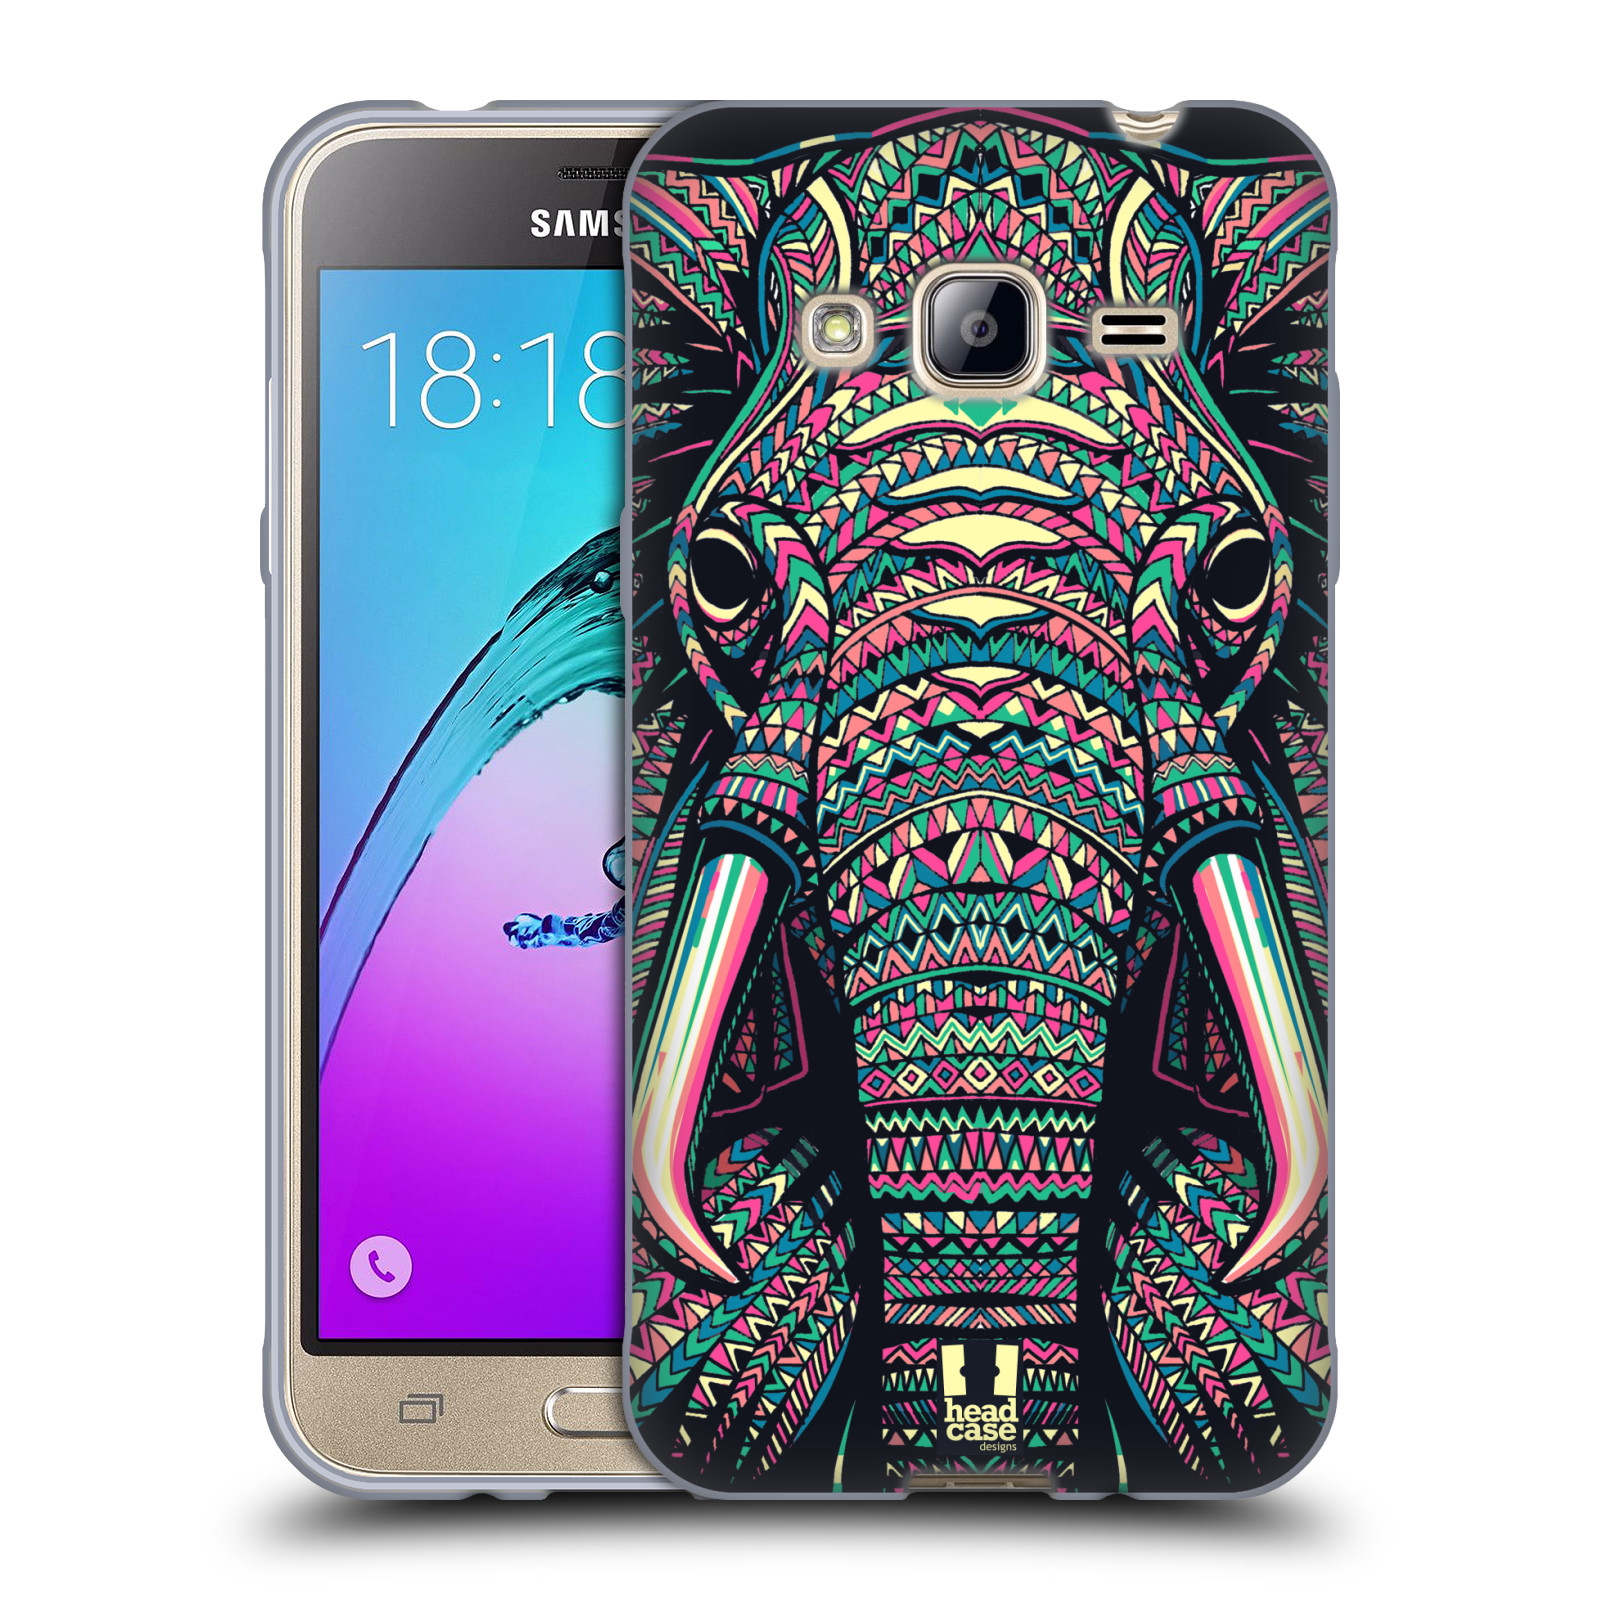 HEAD CASE silikonový obal na mobil Samsung Galaxy J3, J3 2016 vzor Aztécký motiv zvíře 2 slon